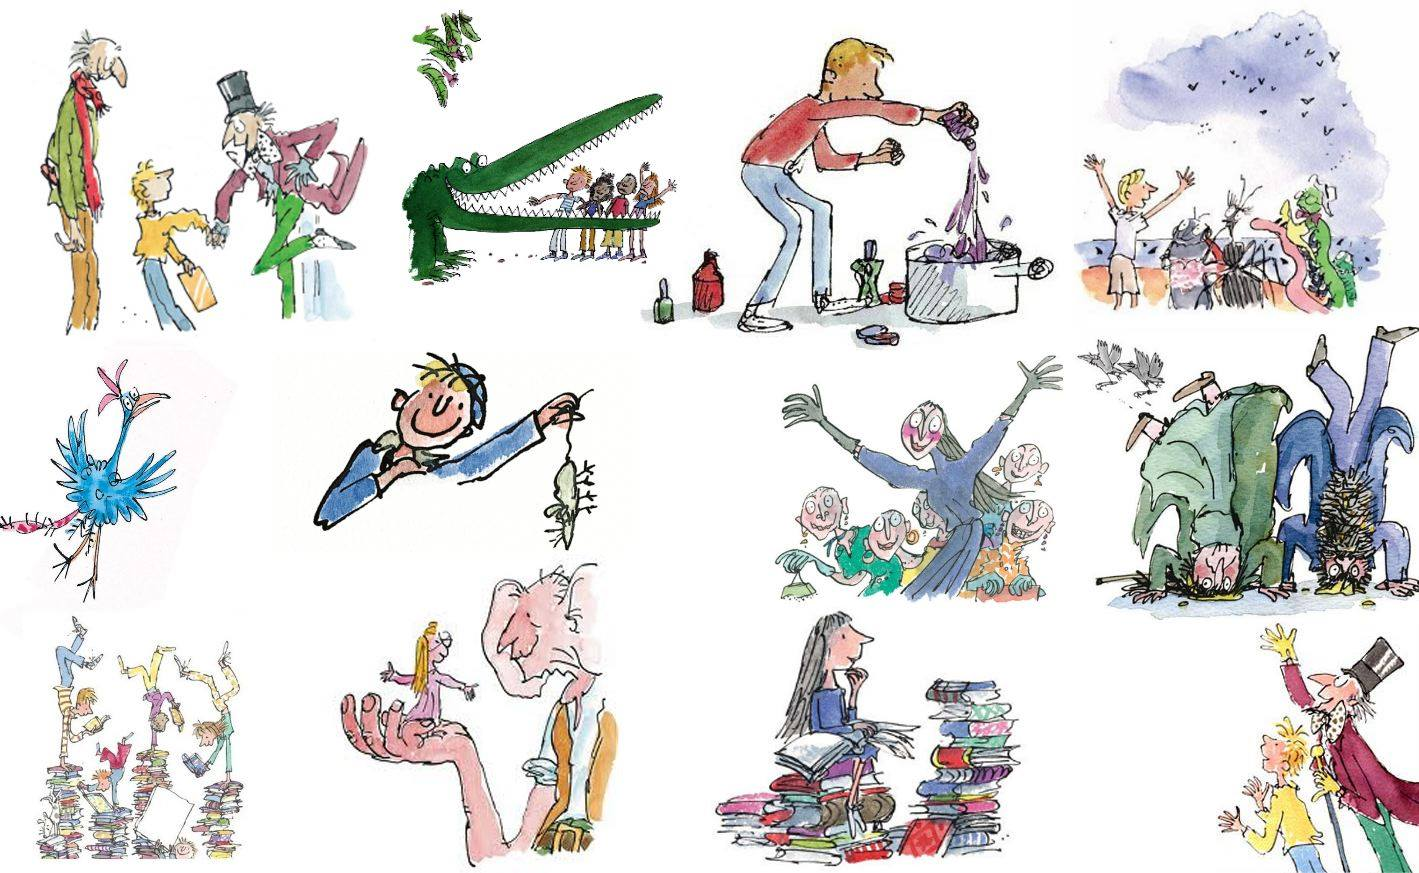 Character Design By 100 Illustrators Pdf : El mÁgico mundo de roald dahl